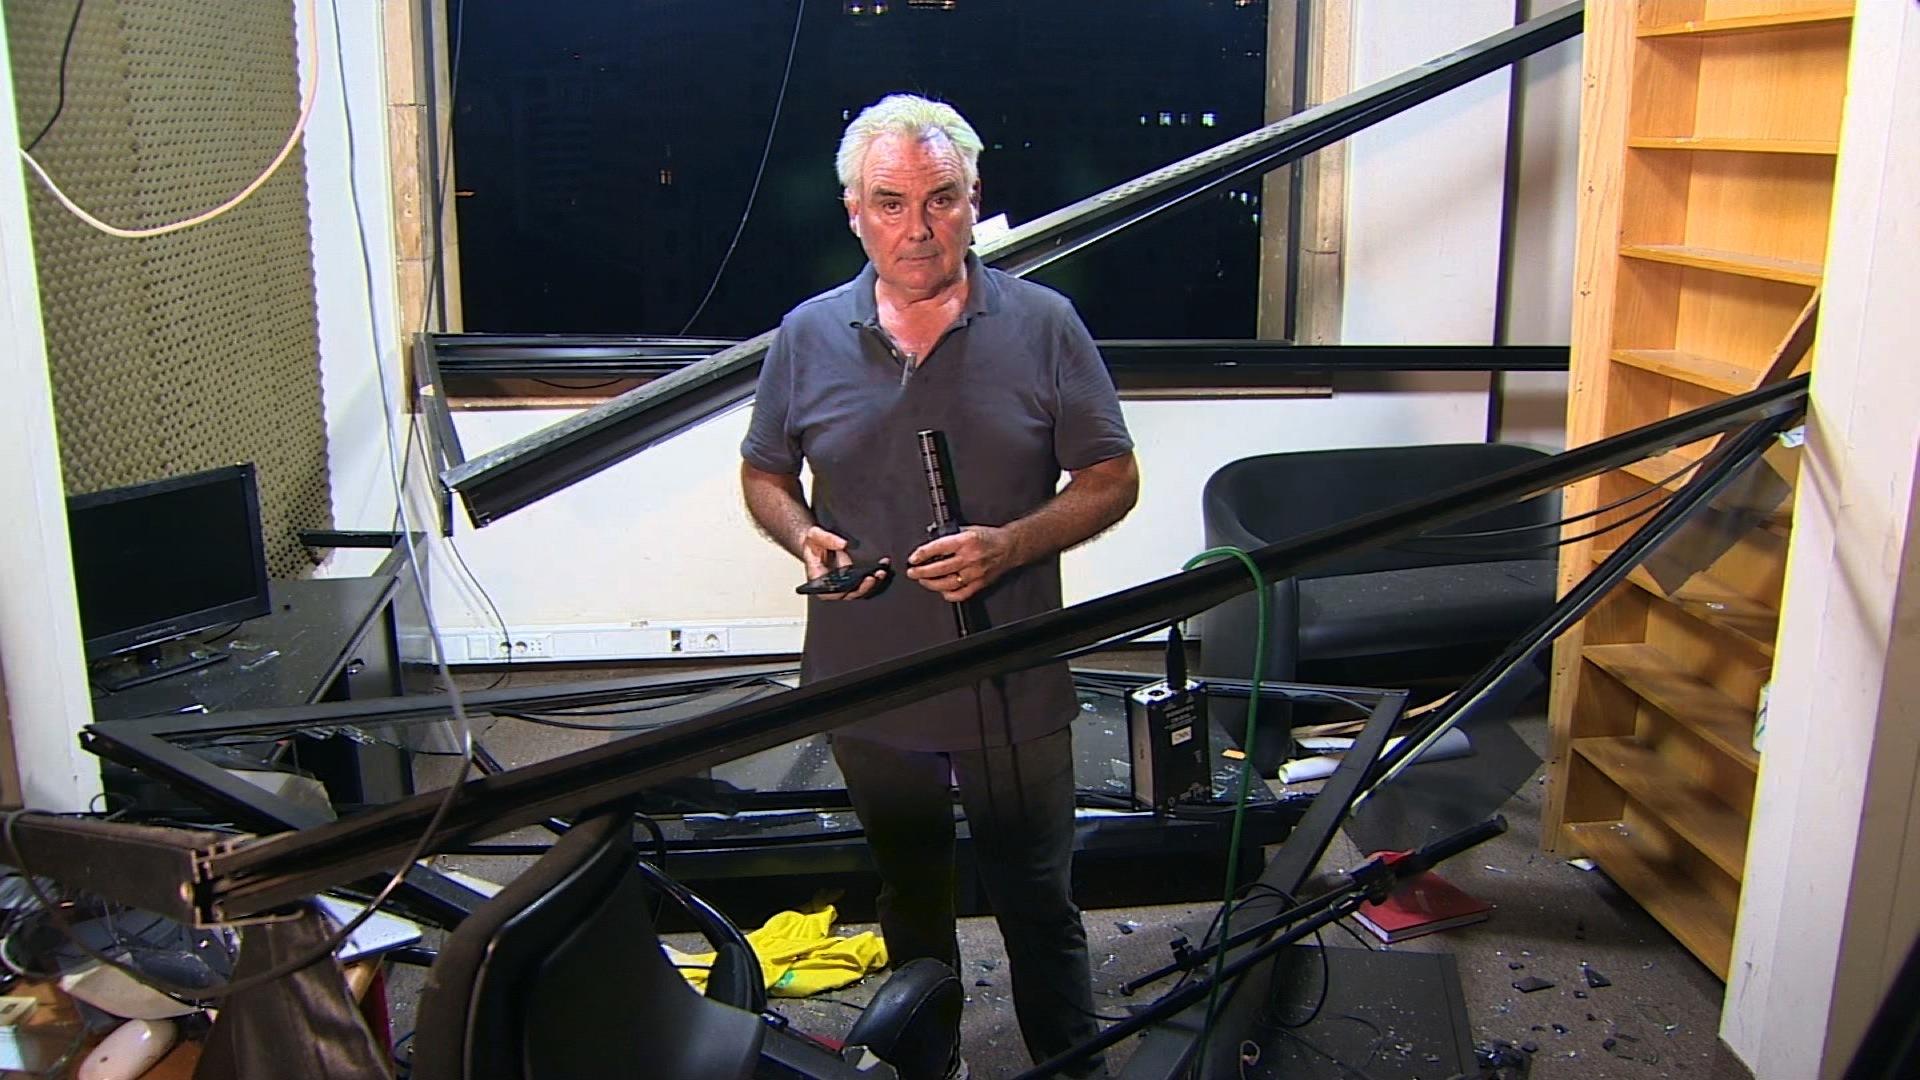 Senior Correspondent Ben Wedeman reports fro CNN's damaged Beirut bureau on Tuesday.